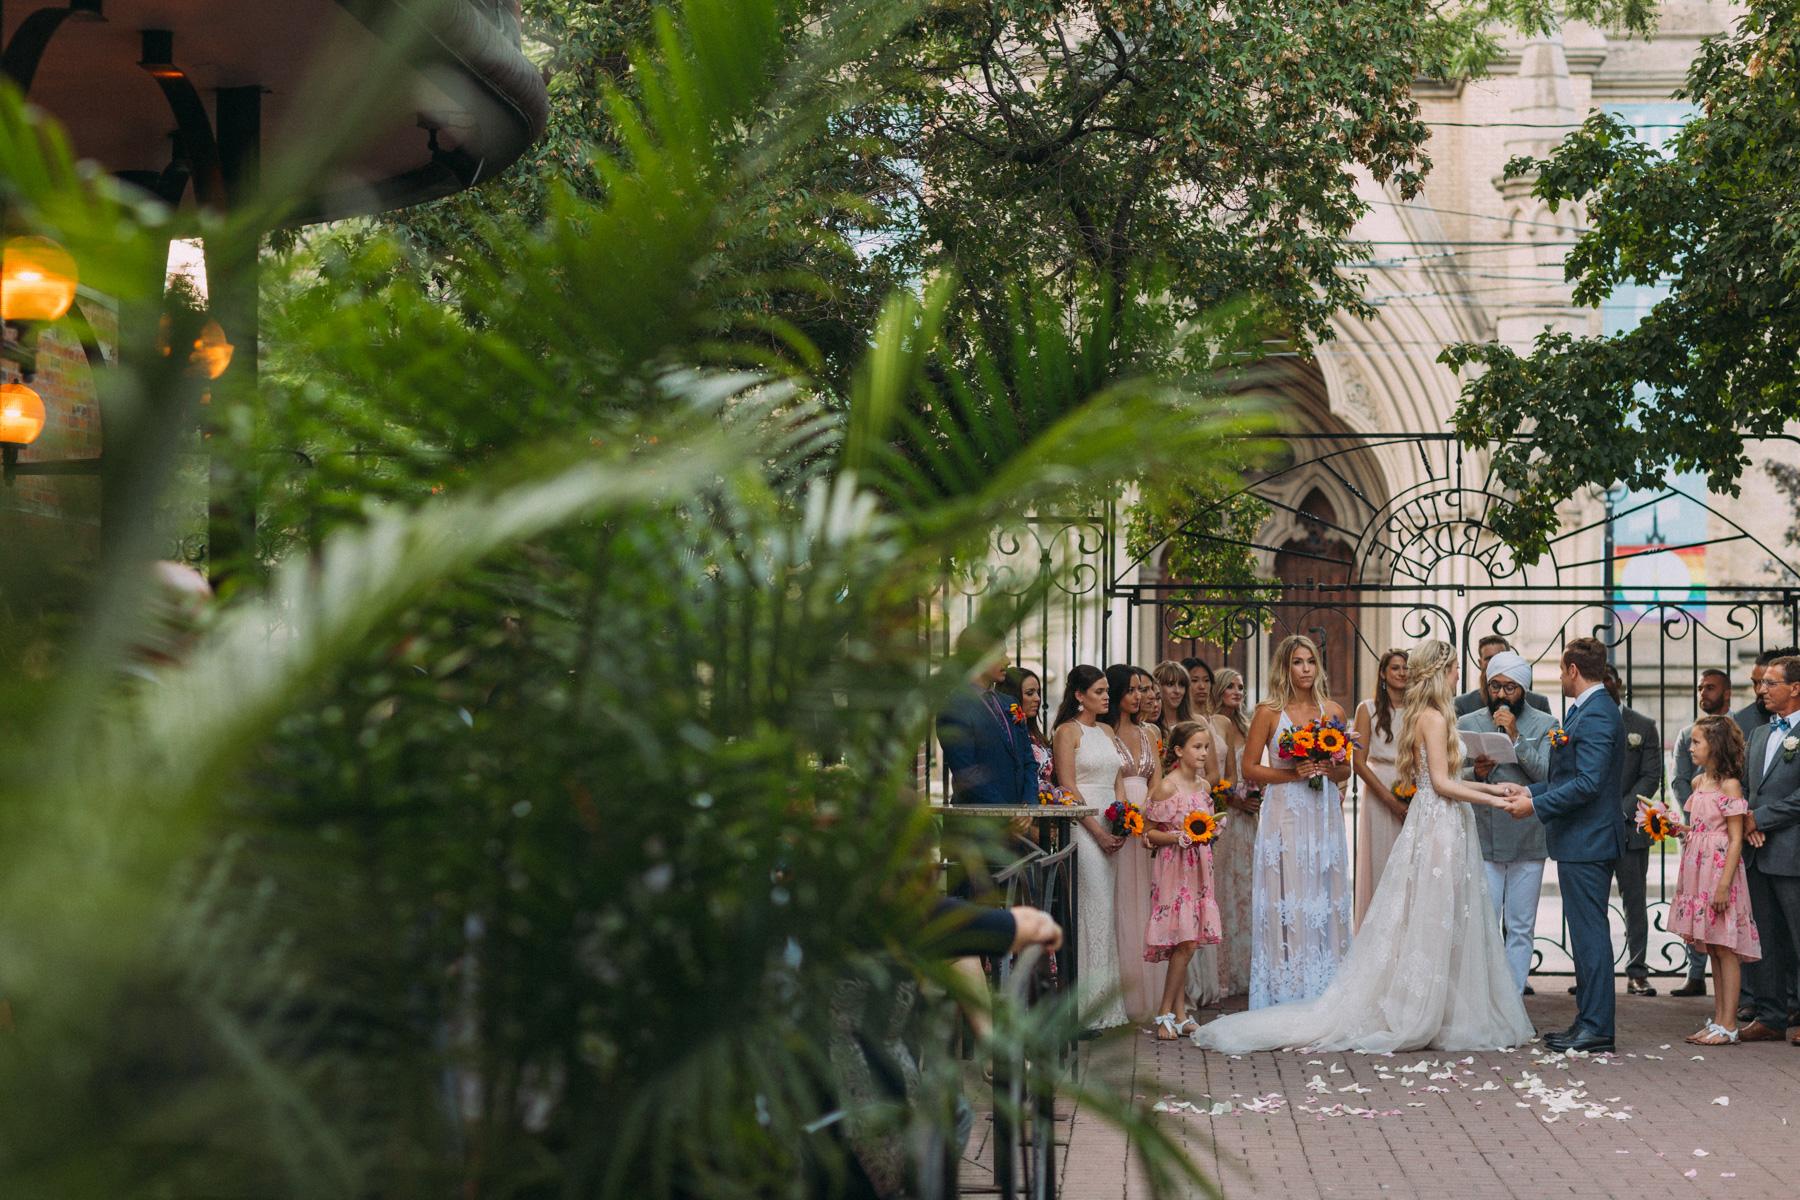 La-Maquette-wedding-by-Toronto-modern-wedding-photographer-Sam-Wong_27.jpg